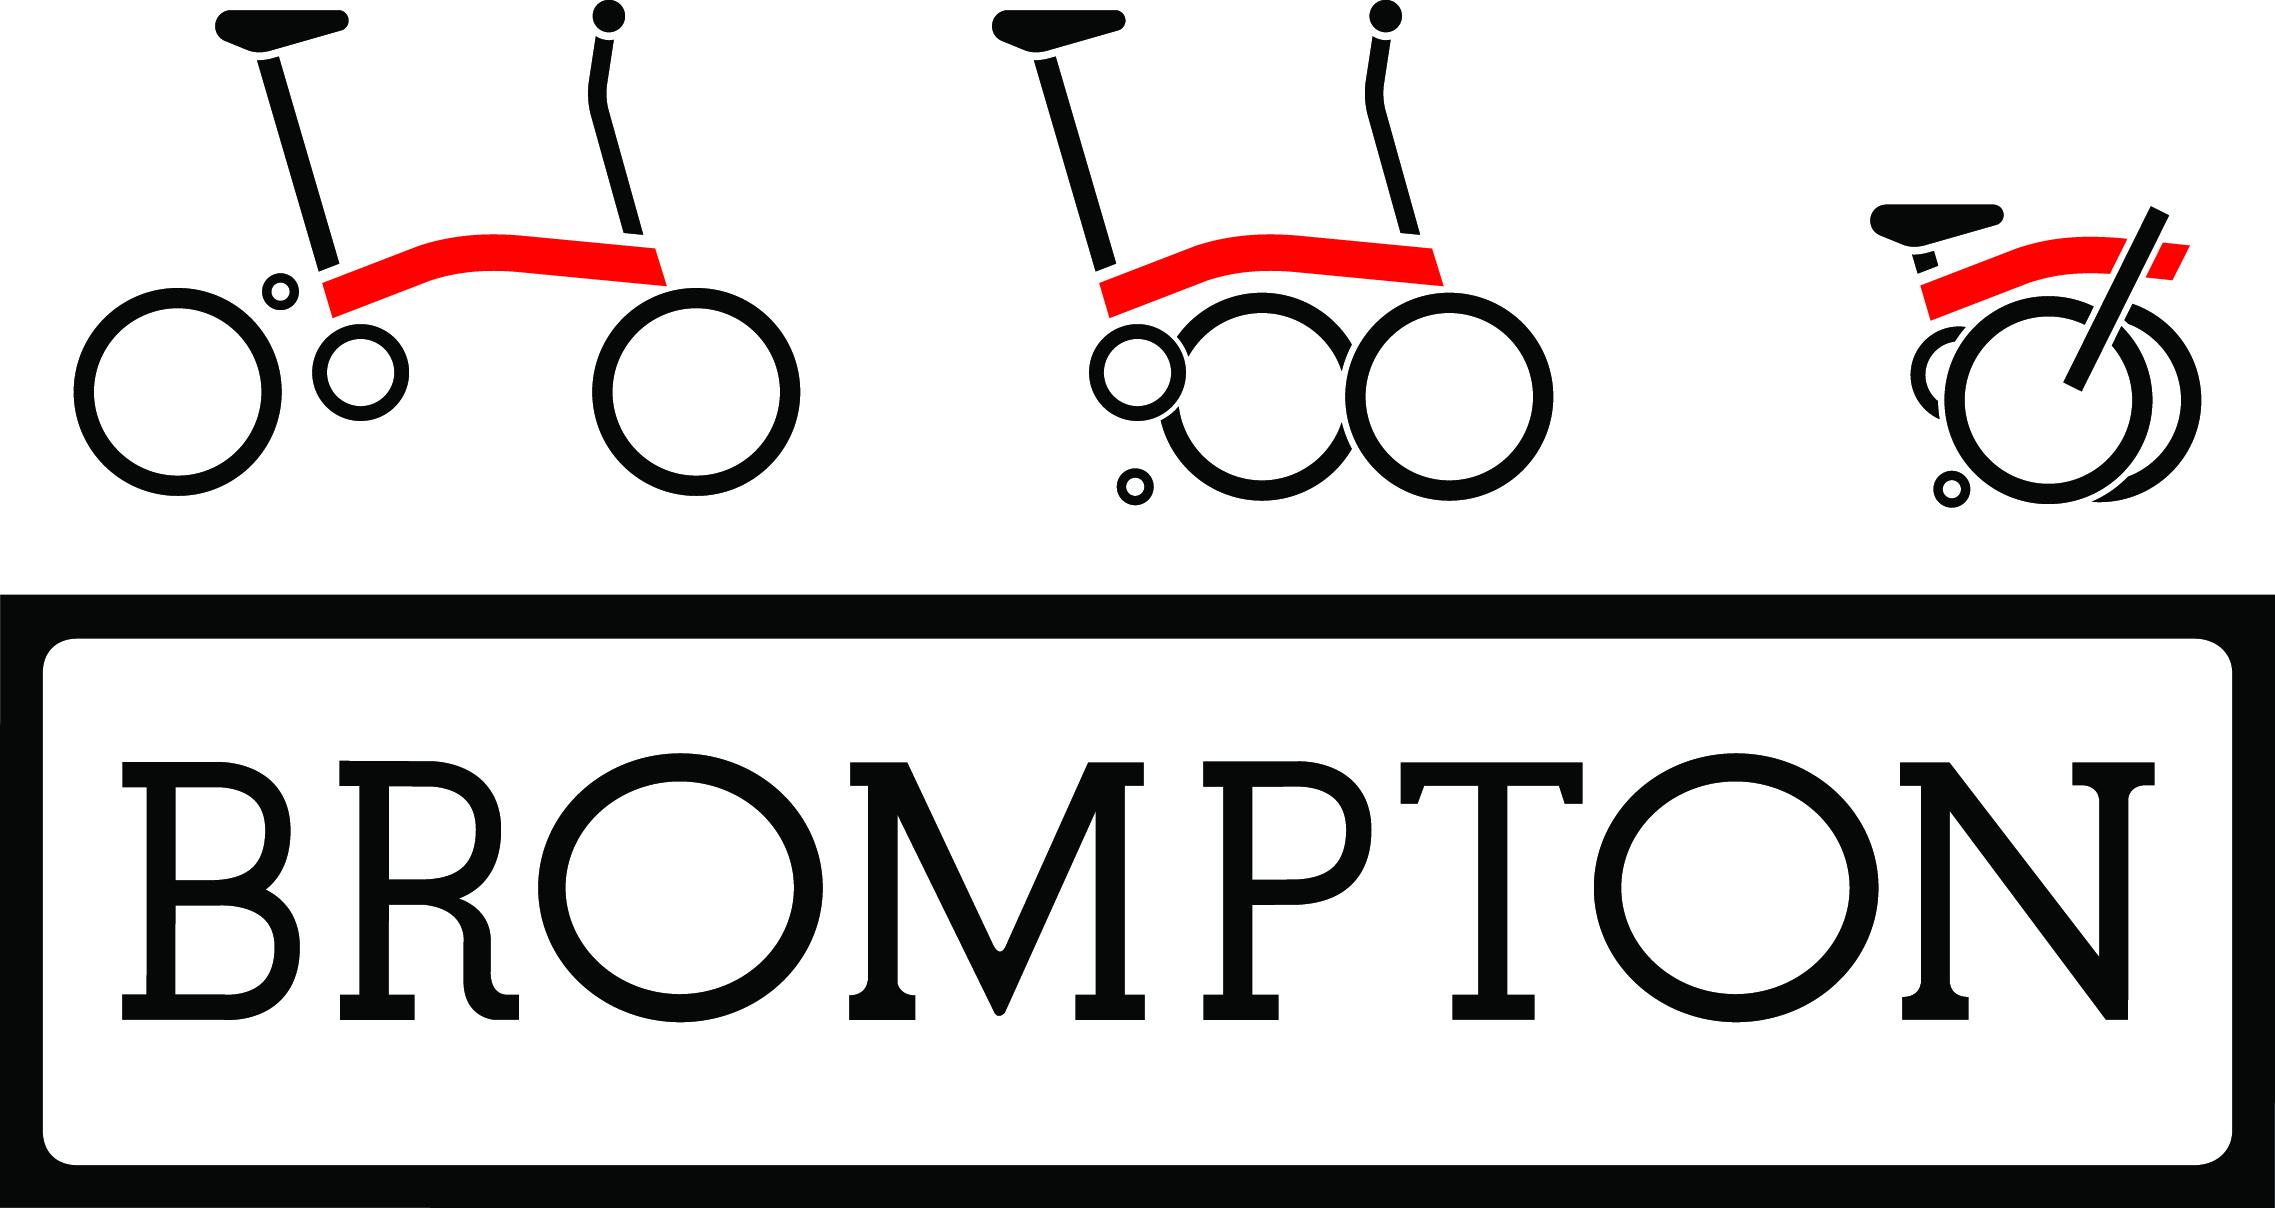 [Documentaire][BBC] Copies de Bromptons et de Stridas [revue de presse] Brompton-logo